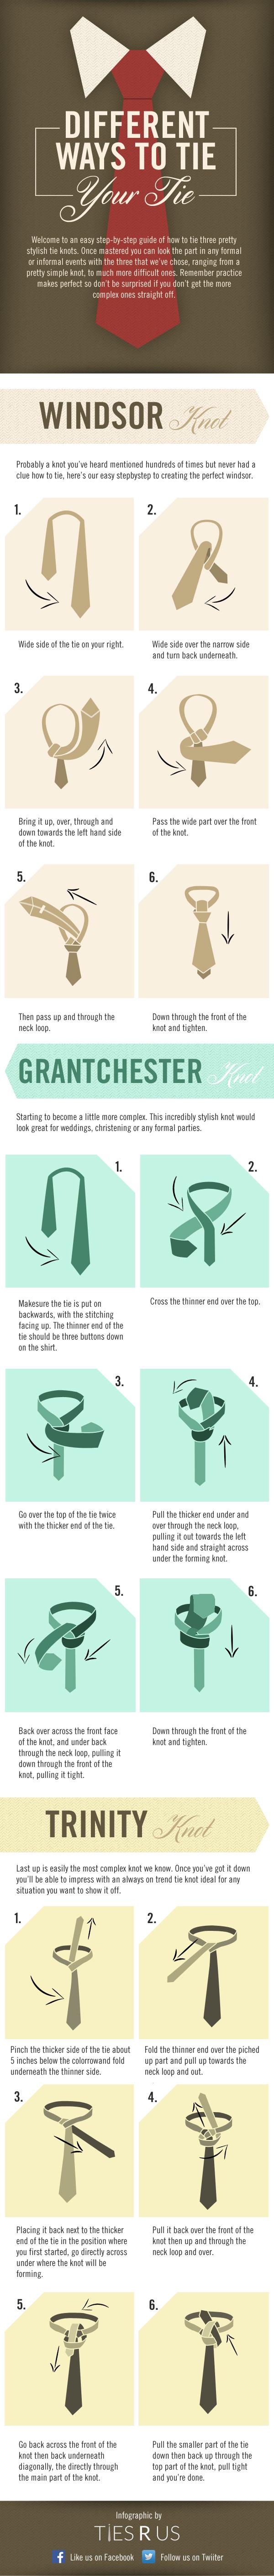 infographics_ties (1)